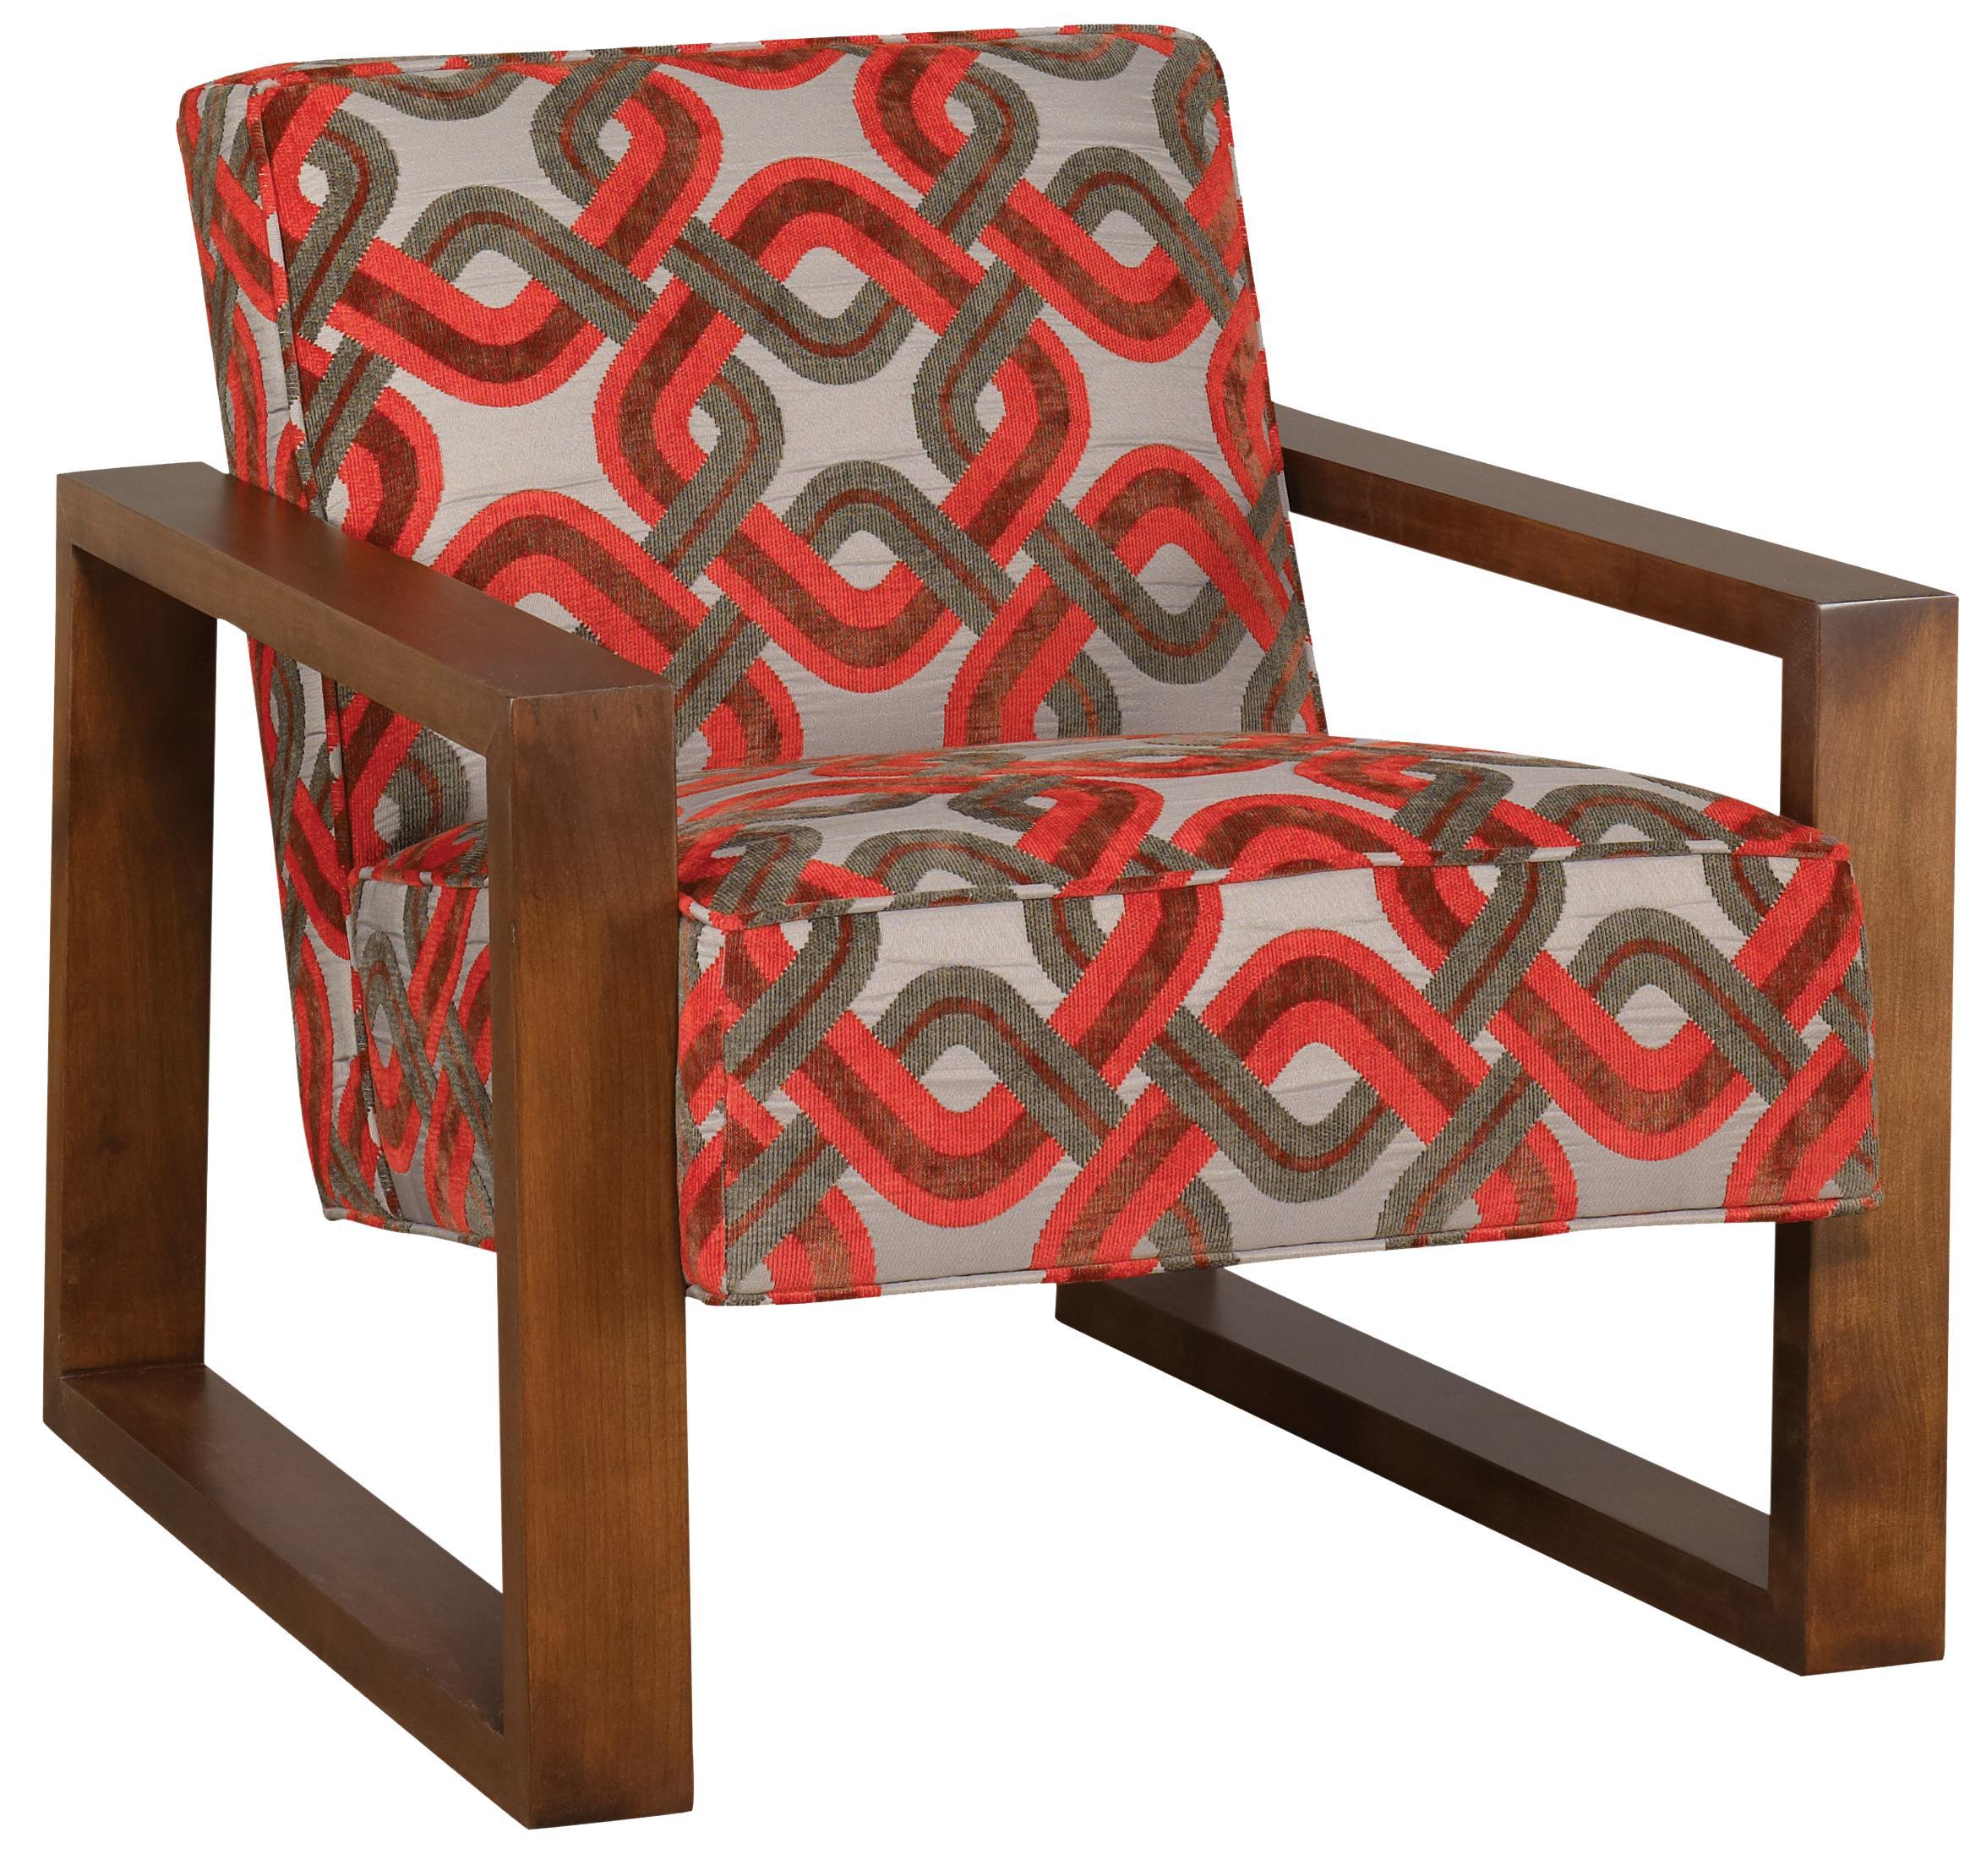 Accentuates Tyson Chair at Williams & Kay